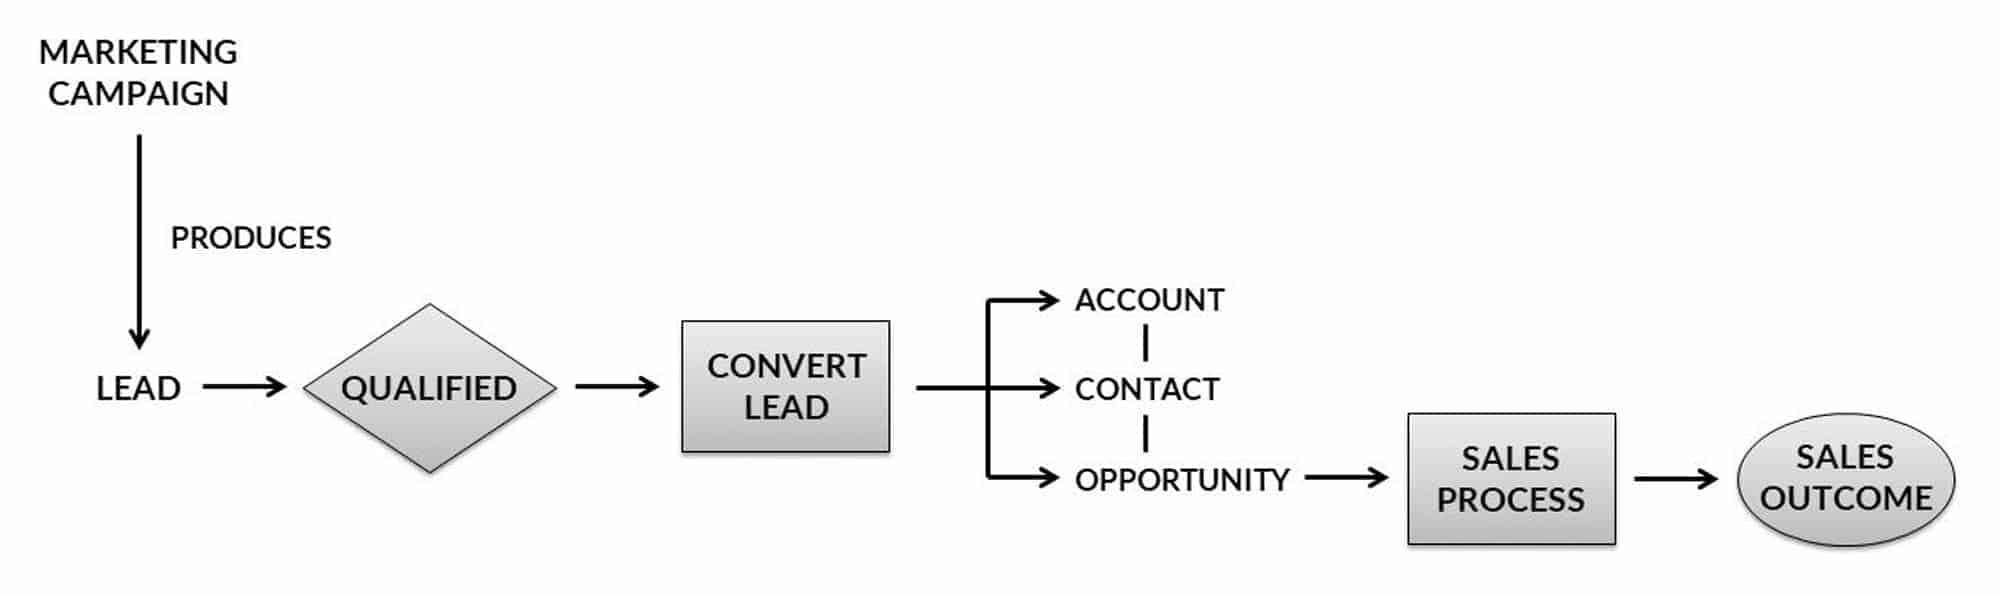 lead-conversion-engagebay